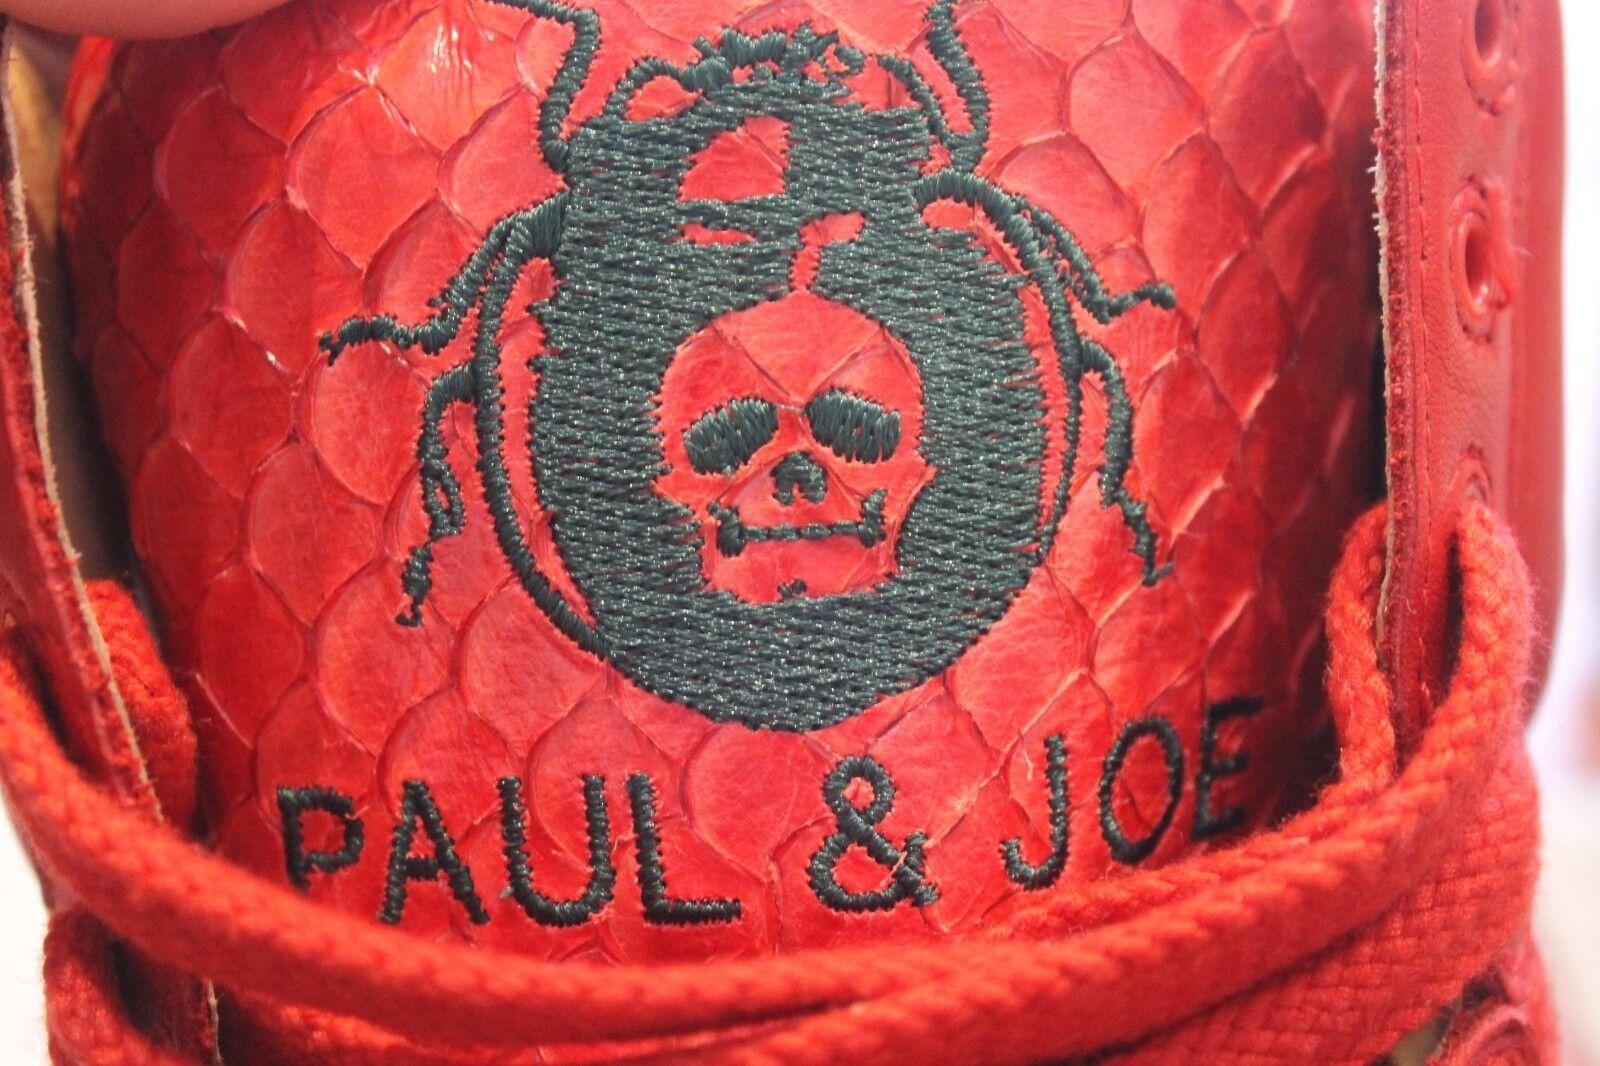 TERRA PLANA PAUL x PAUL PLANA & JOE | ECO FRIENDLY | LIMITED EDITION HI-TOP SNEAKERS d08f5b